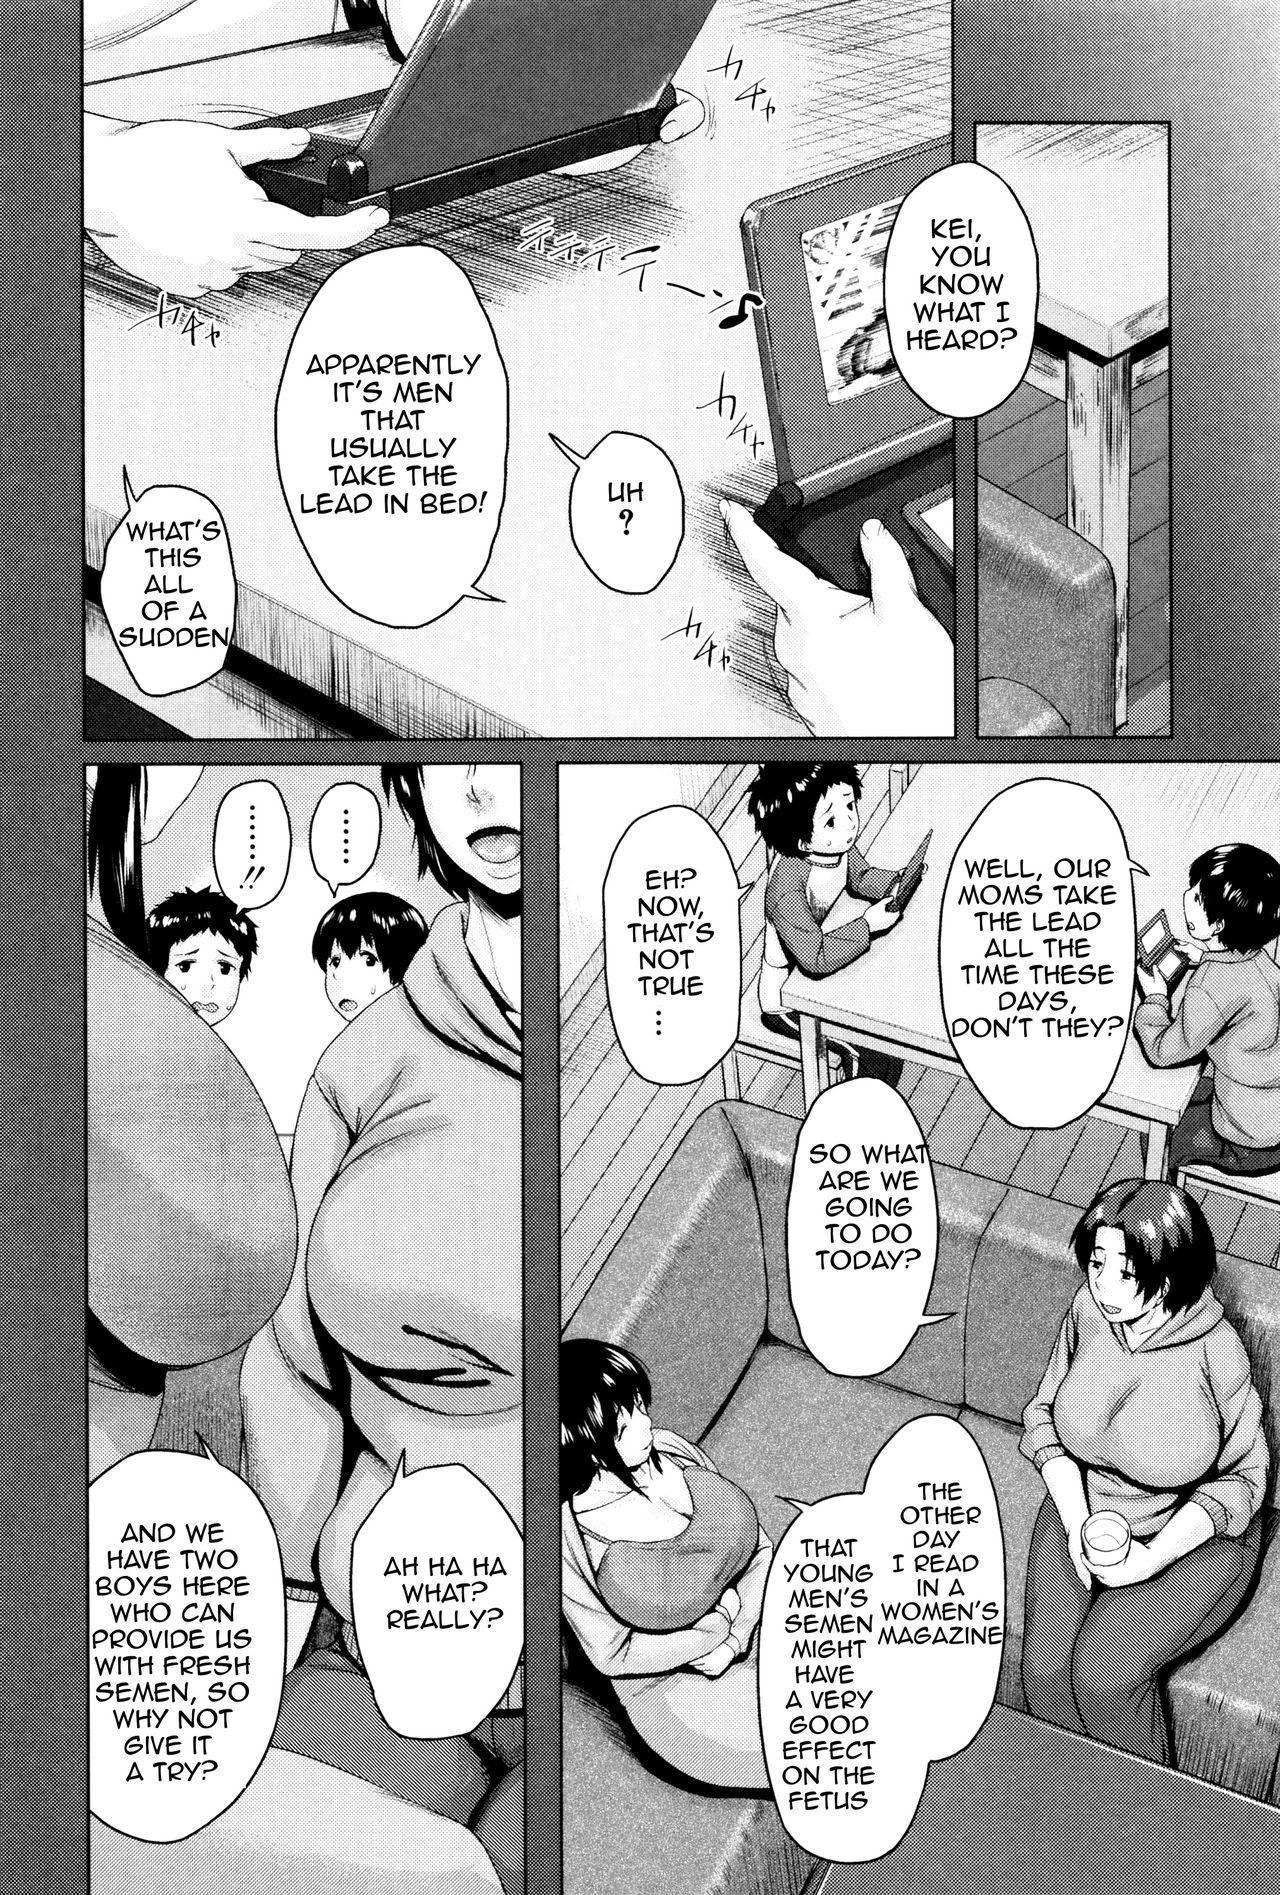 [Jitsuma] Kinyoubi no Haha-tachi e - To Friday's mothers [English] [Amoskandy, desudesu, Kusanyagi] 170